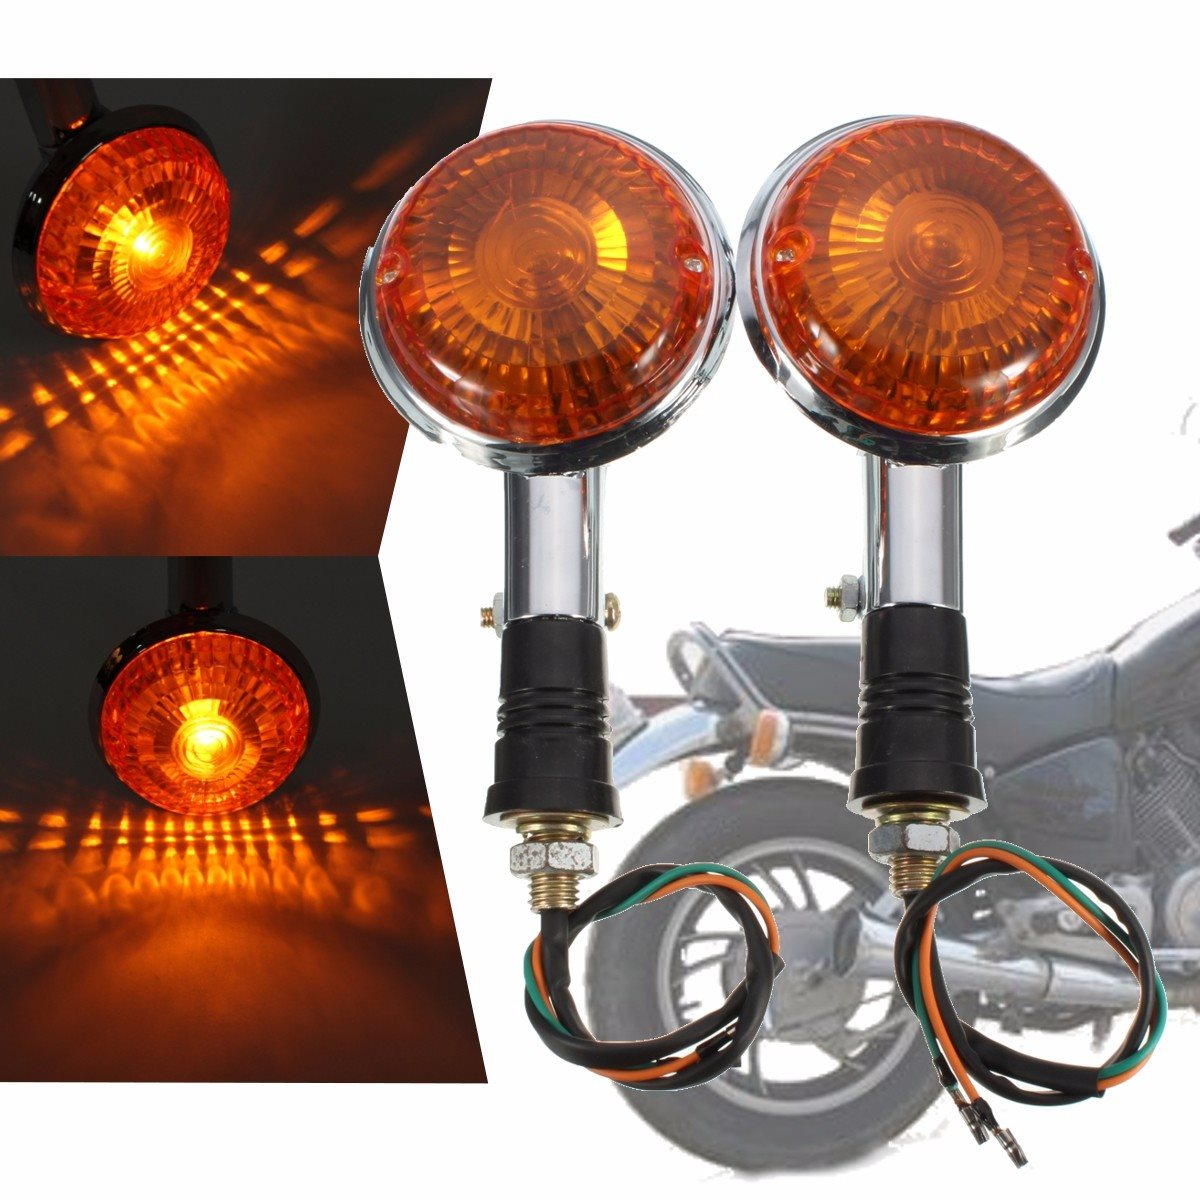 2pcs Amber Lens Motorcycle Turn Signal Indicator Light Front Rear Flasher Blinker Light For Yamaha Virago Maxim V-Max maxim 15